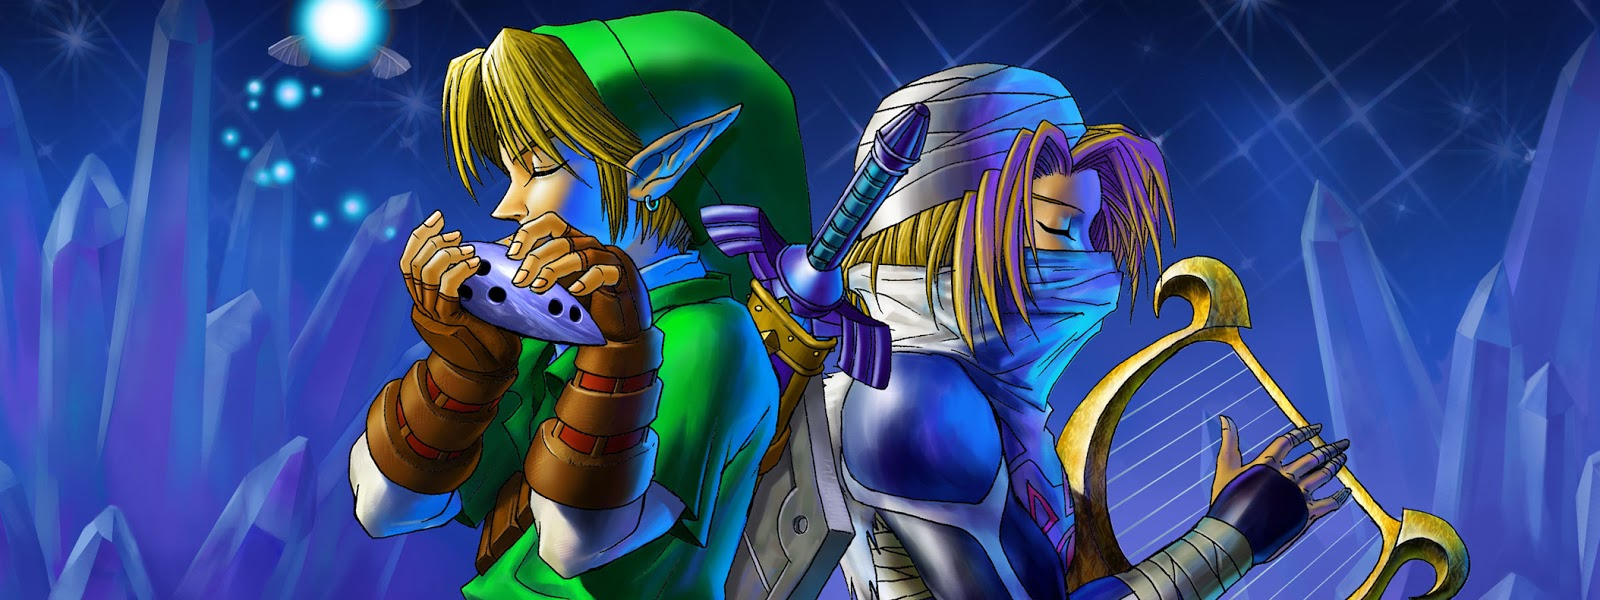 Free Download Zelda Ocarina Of Time 3ds Wallpaper Hd Wallpapers